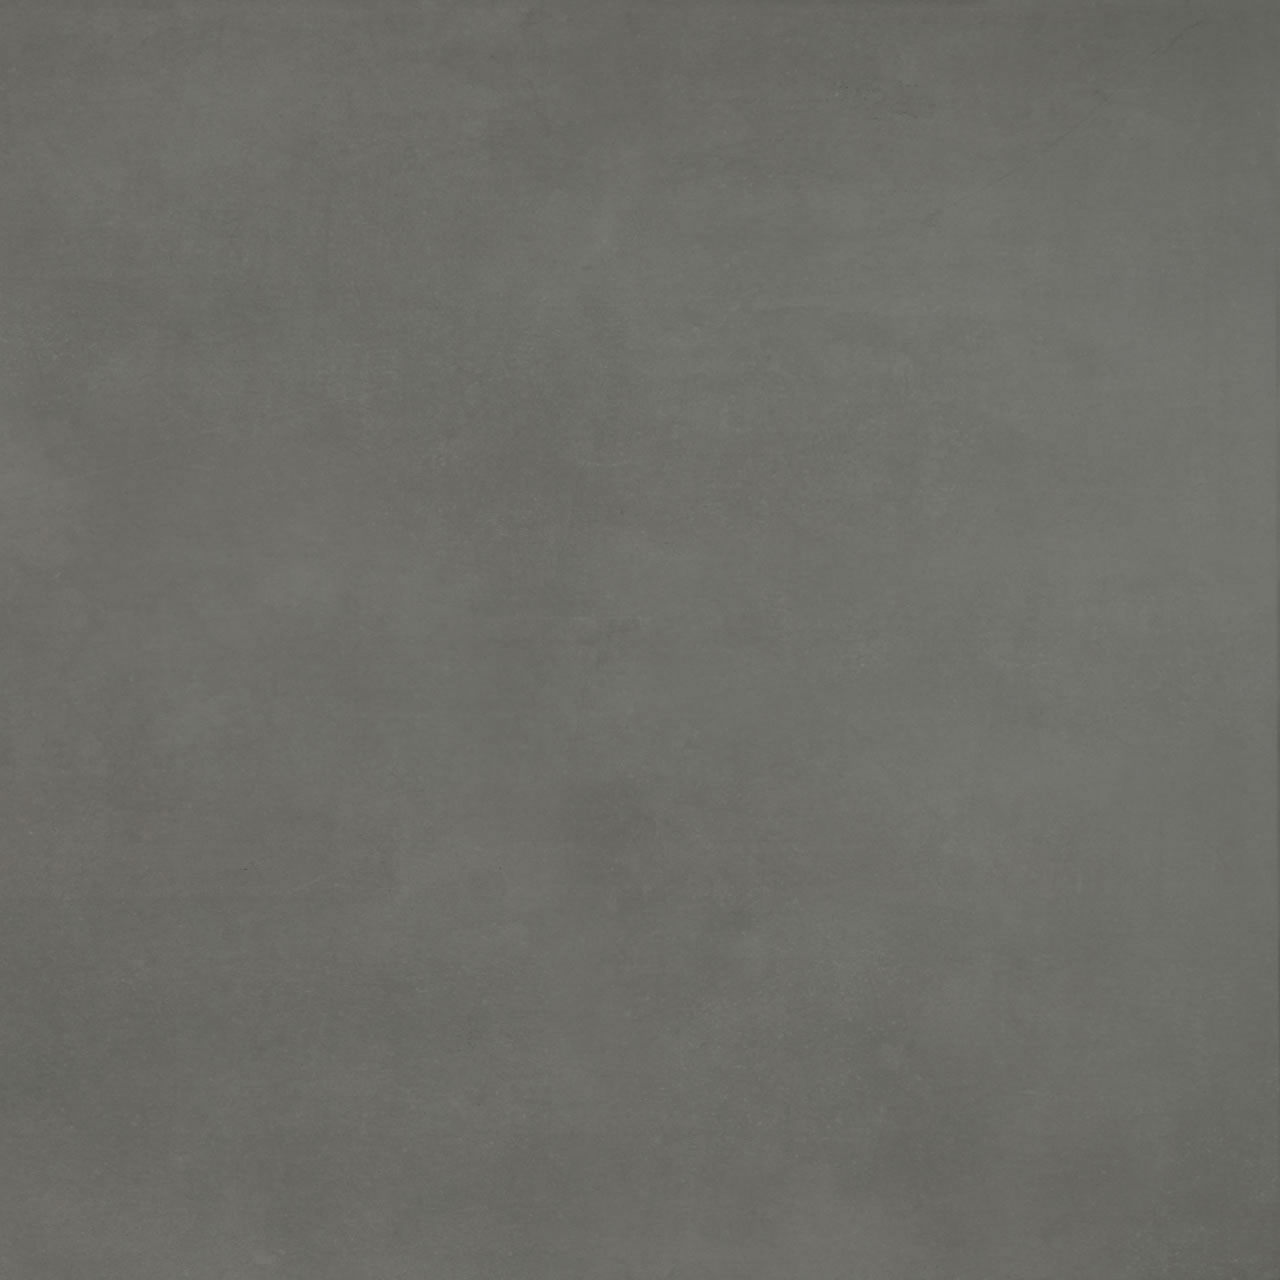 Yuna clean concrete ac go 60×60